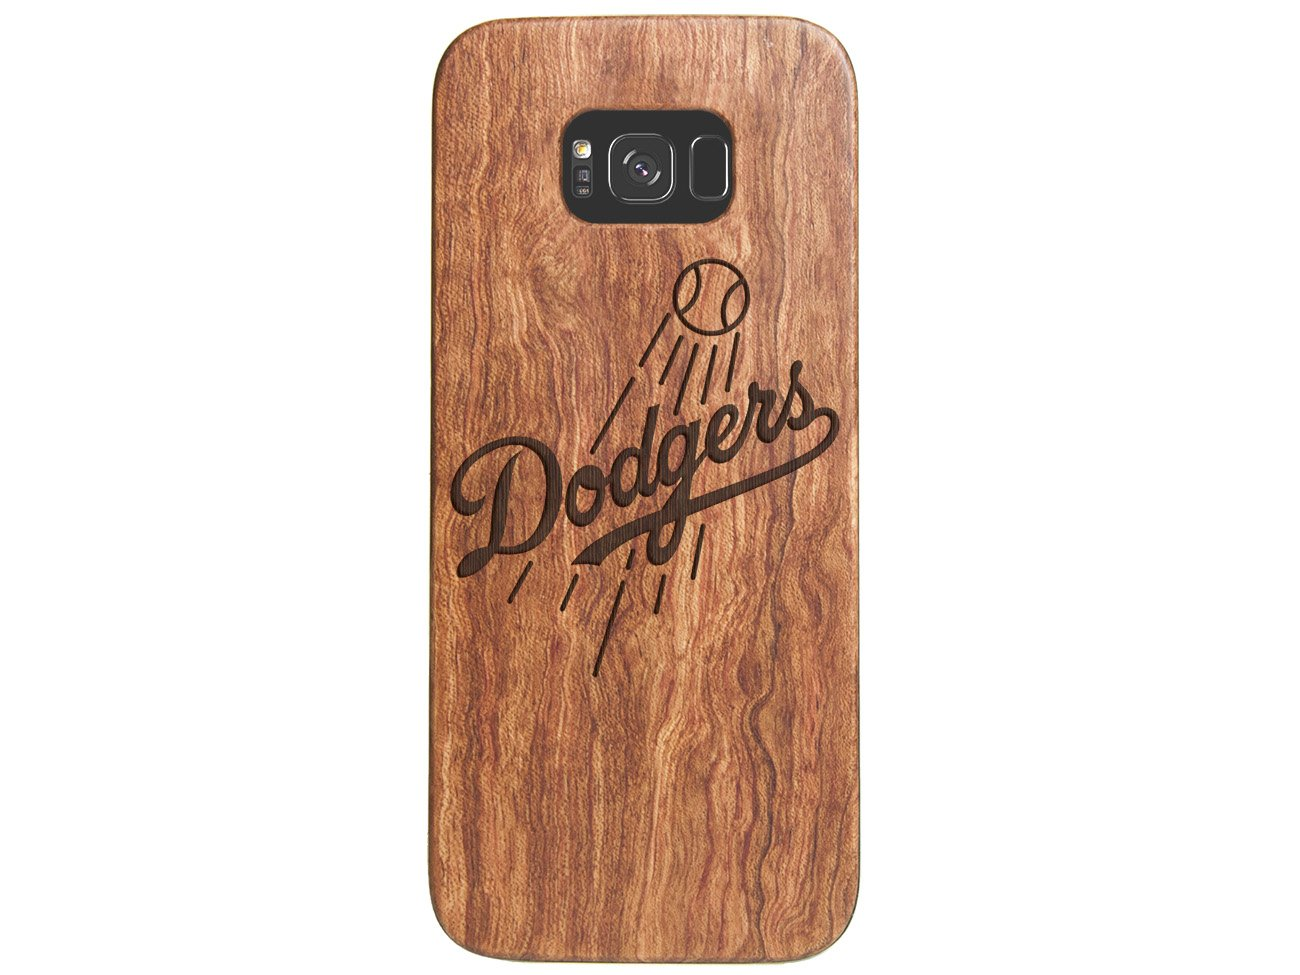 Los Angeles Dodgers Galaxy S8 Plus Case